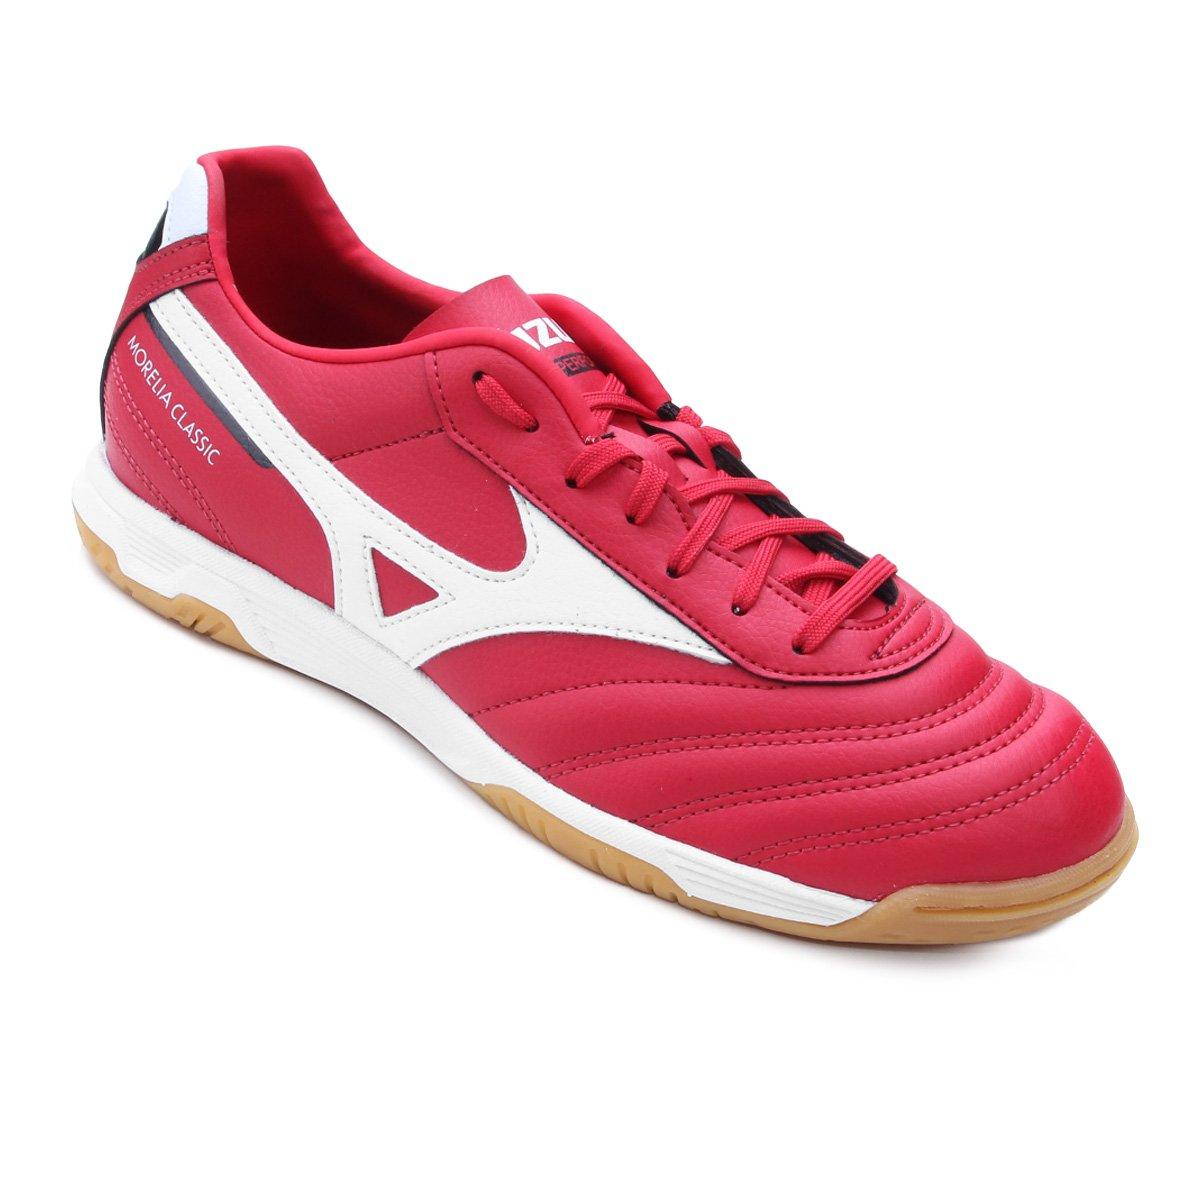 3ee181bbc Chuteira Futsal Mizuno Morelia Classic IN P - Vermelho e Branco - Compre  Agora